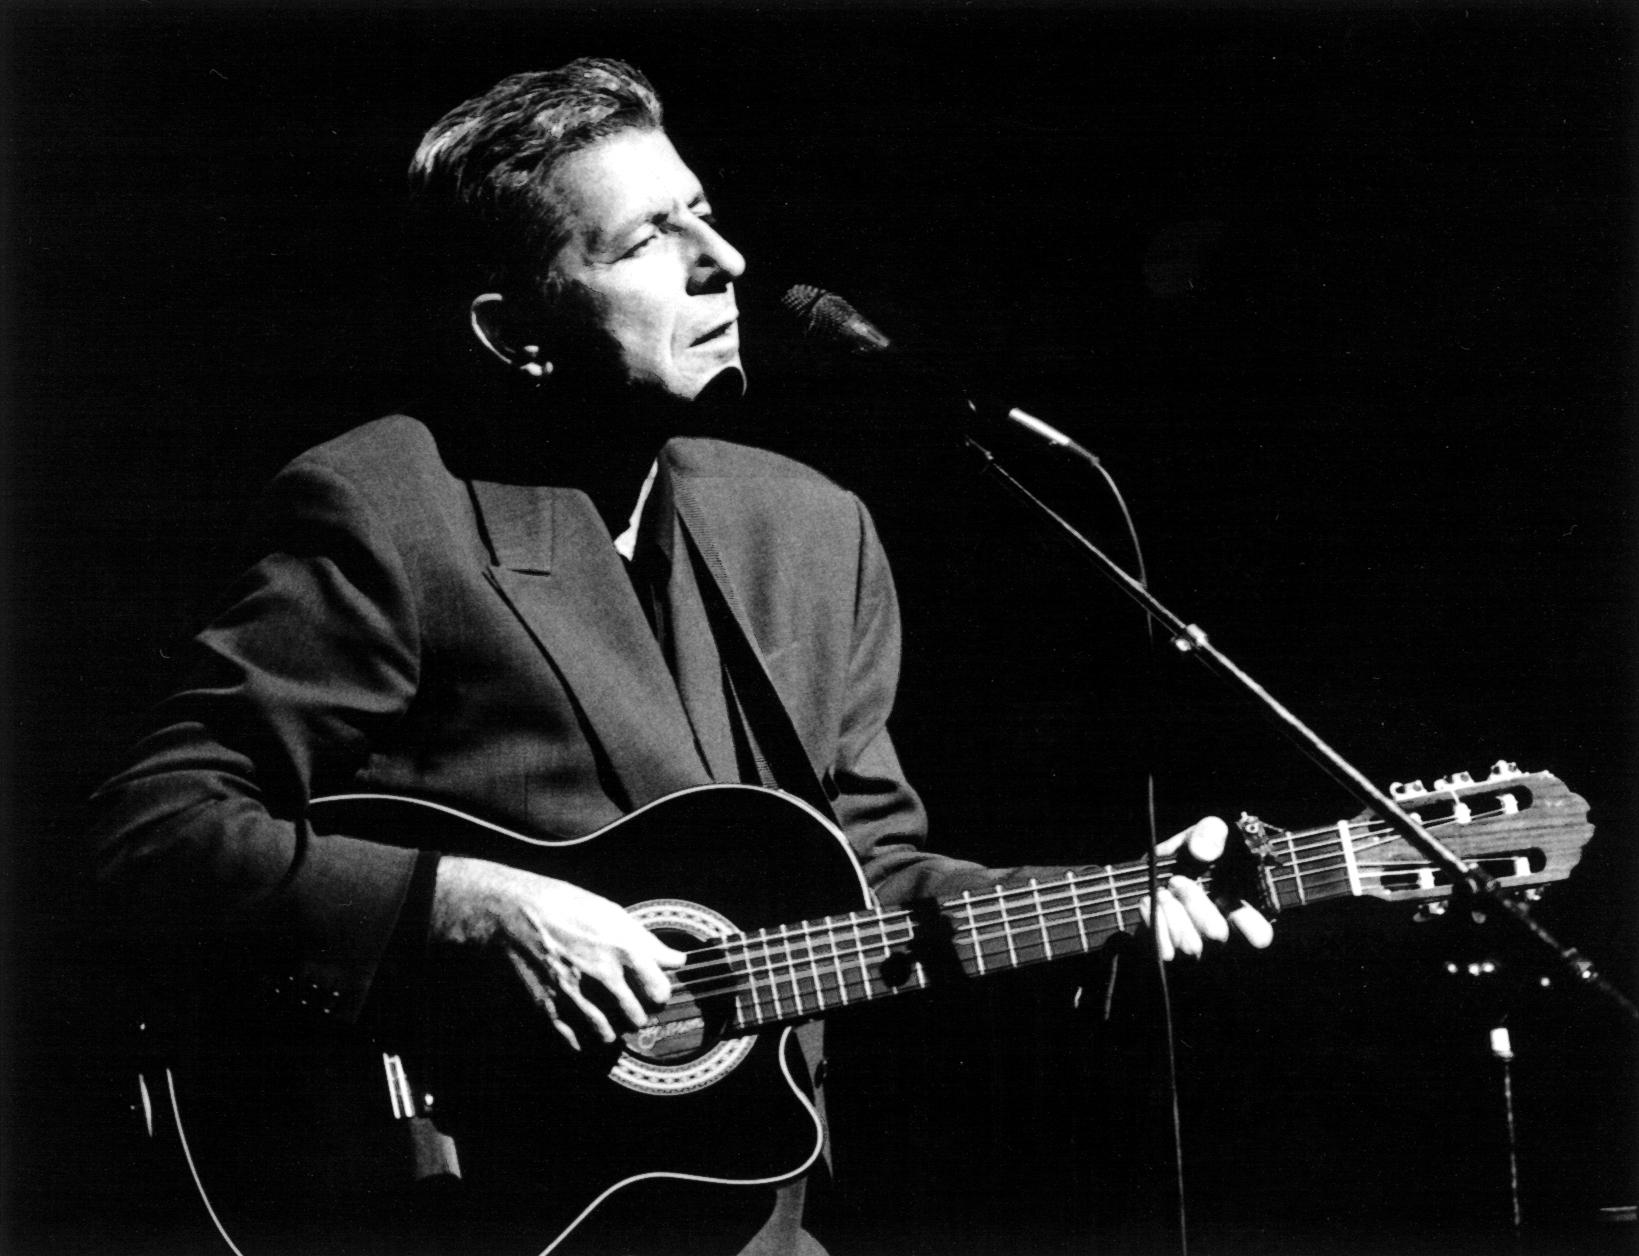 Leonard Cohen, musician